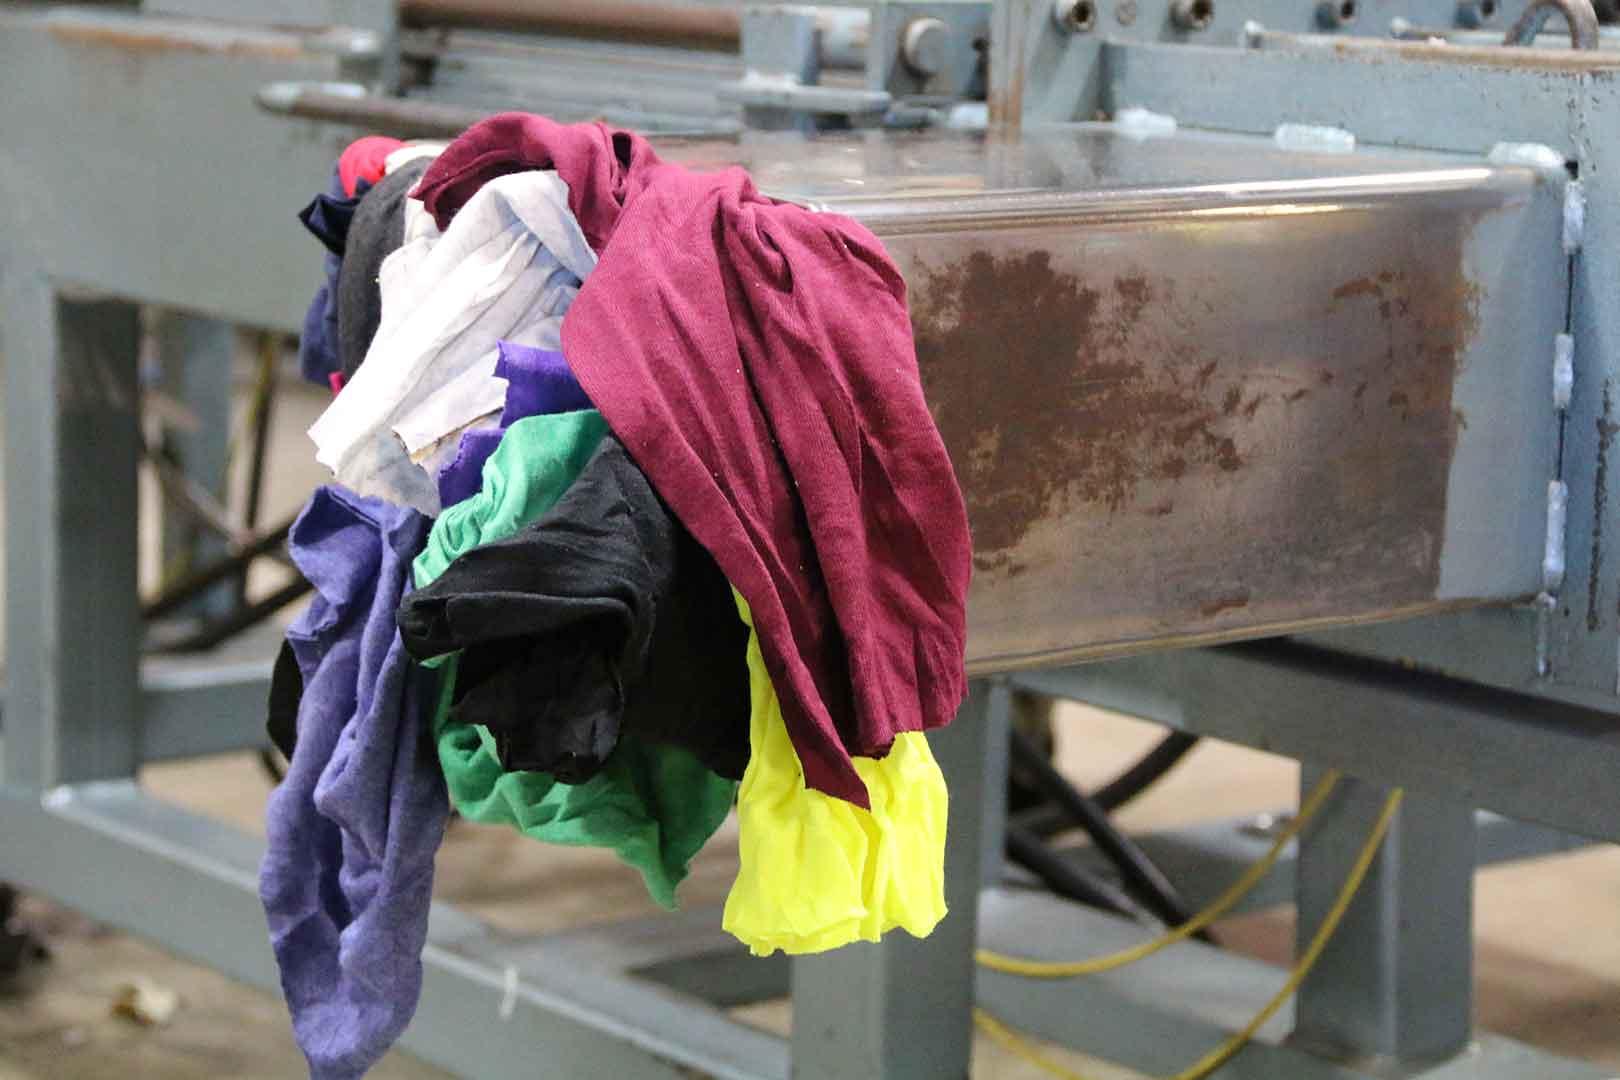 rags entering packaging machine